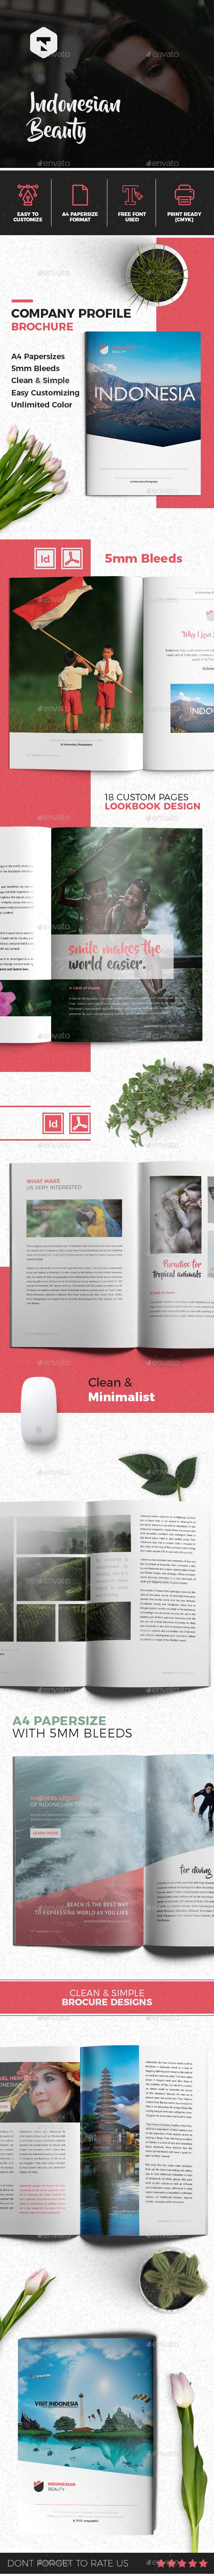 Multipurpose Corporate Brochure Vol. 27 - Brochures Print Templates